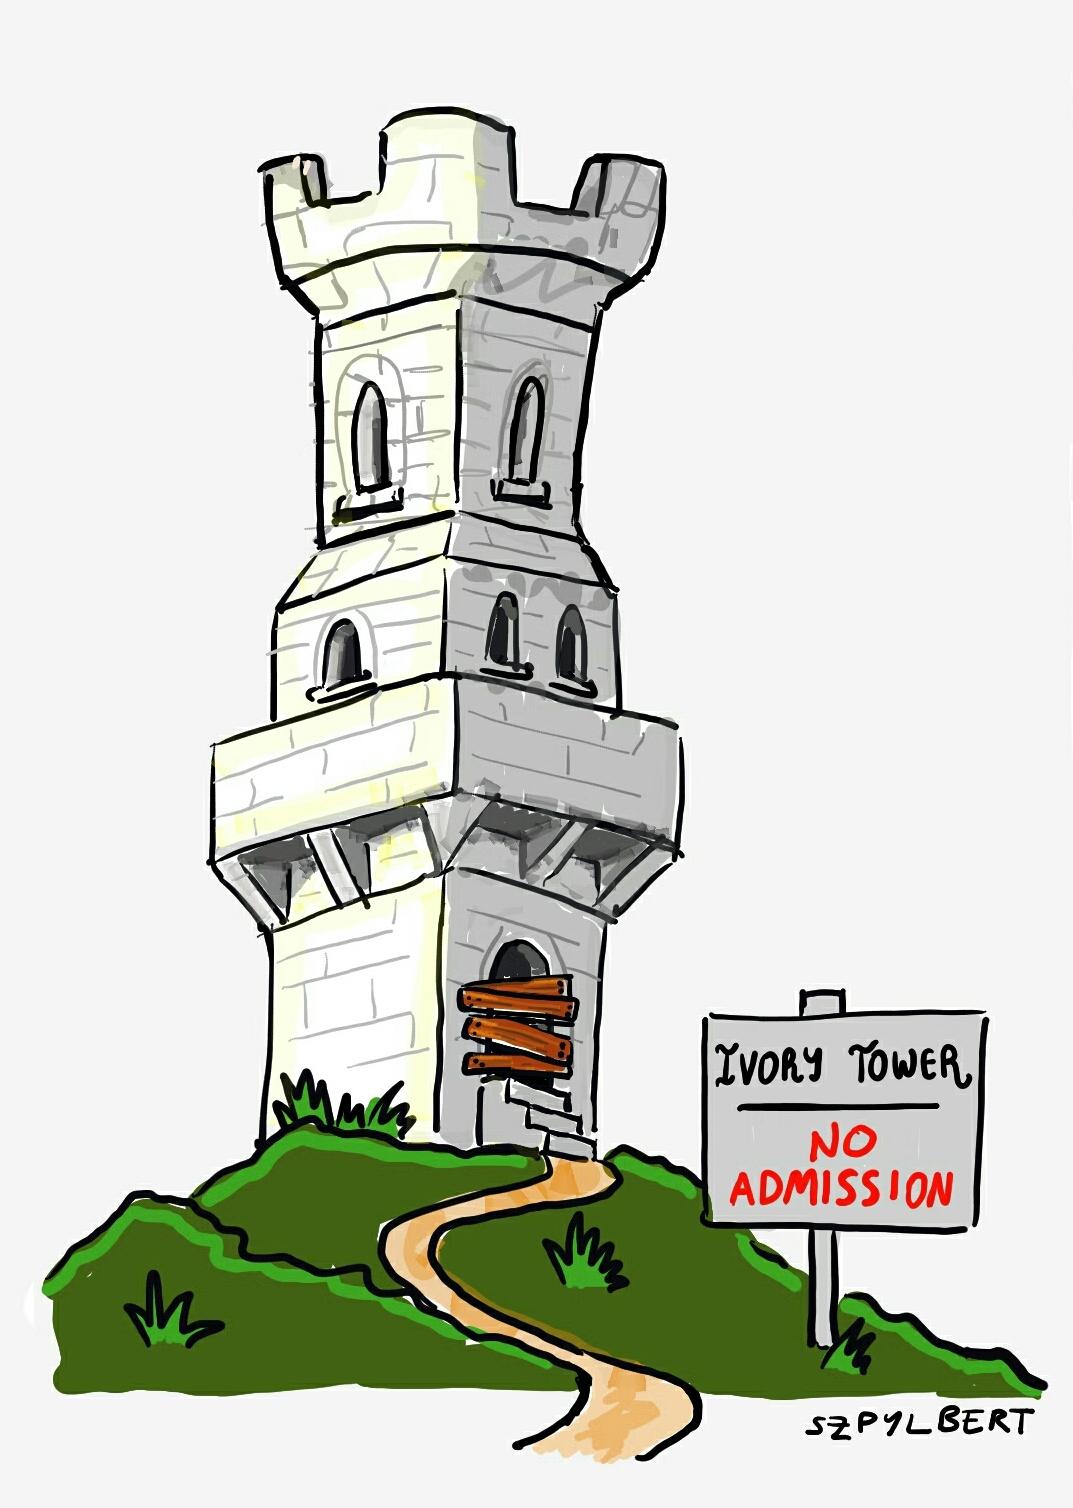 Szpylbert cartoon about trying to get a job as an academic